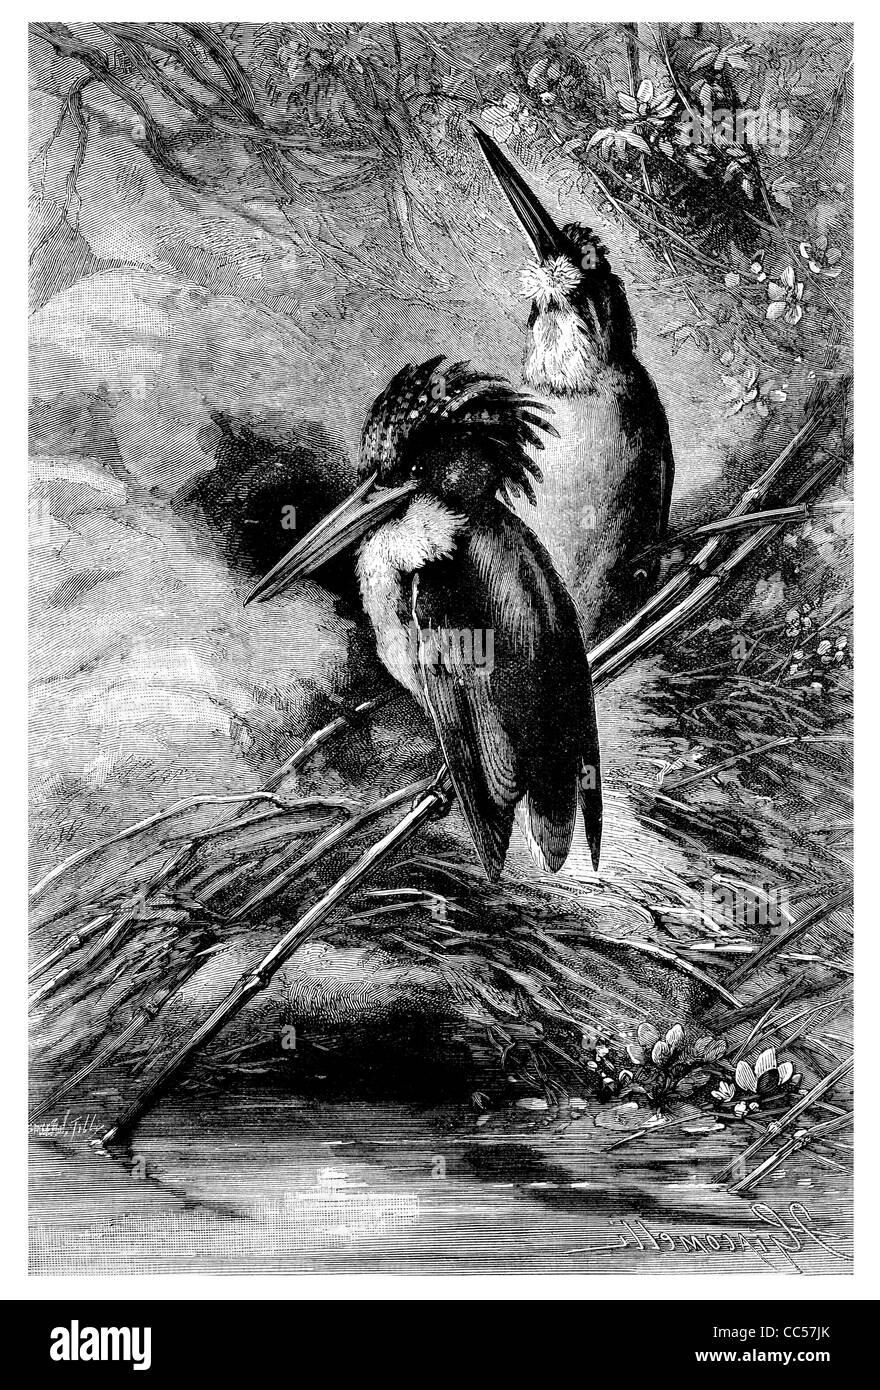 Malachite crested African Kingfisher - Stock Image